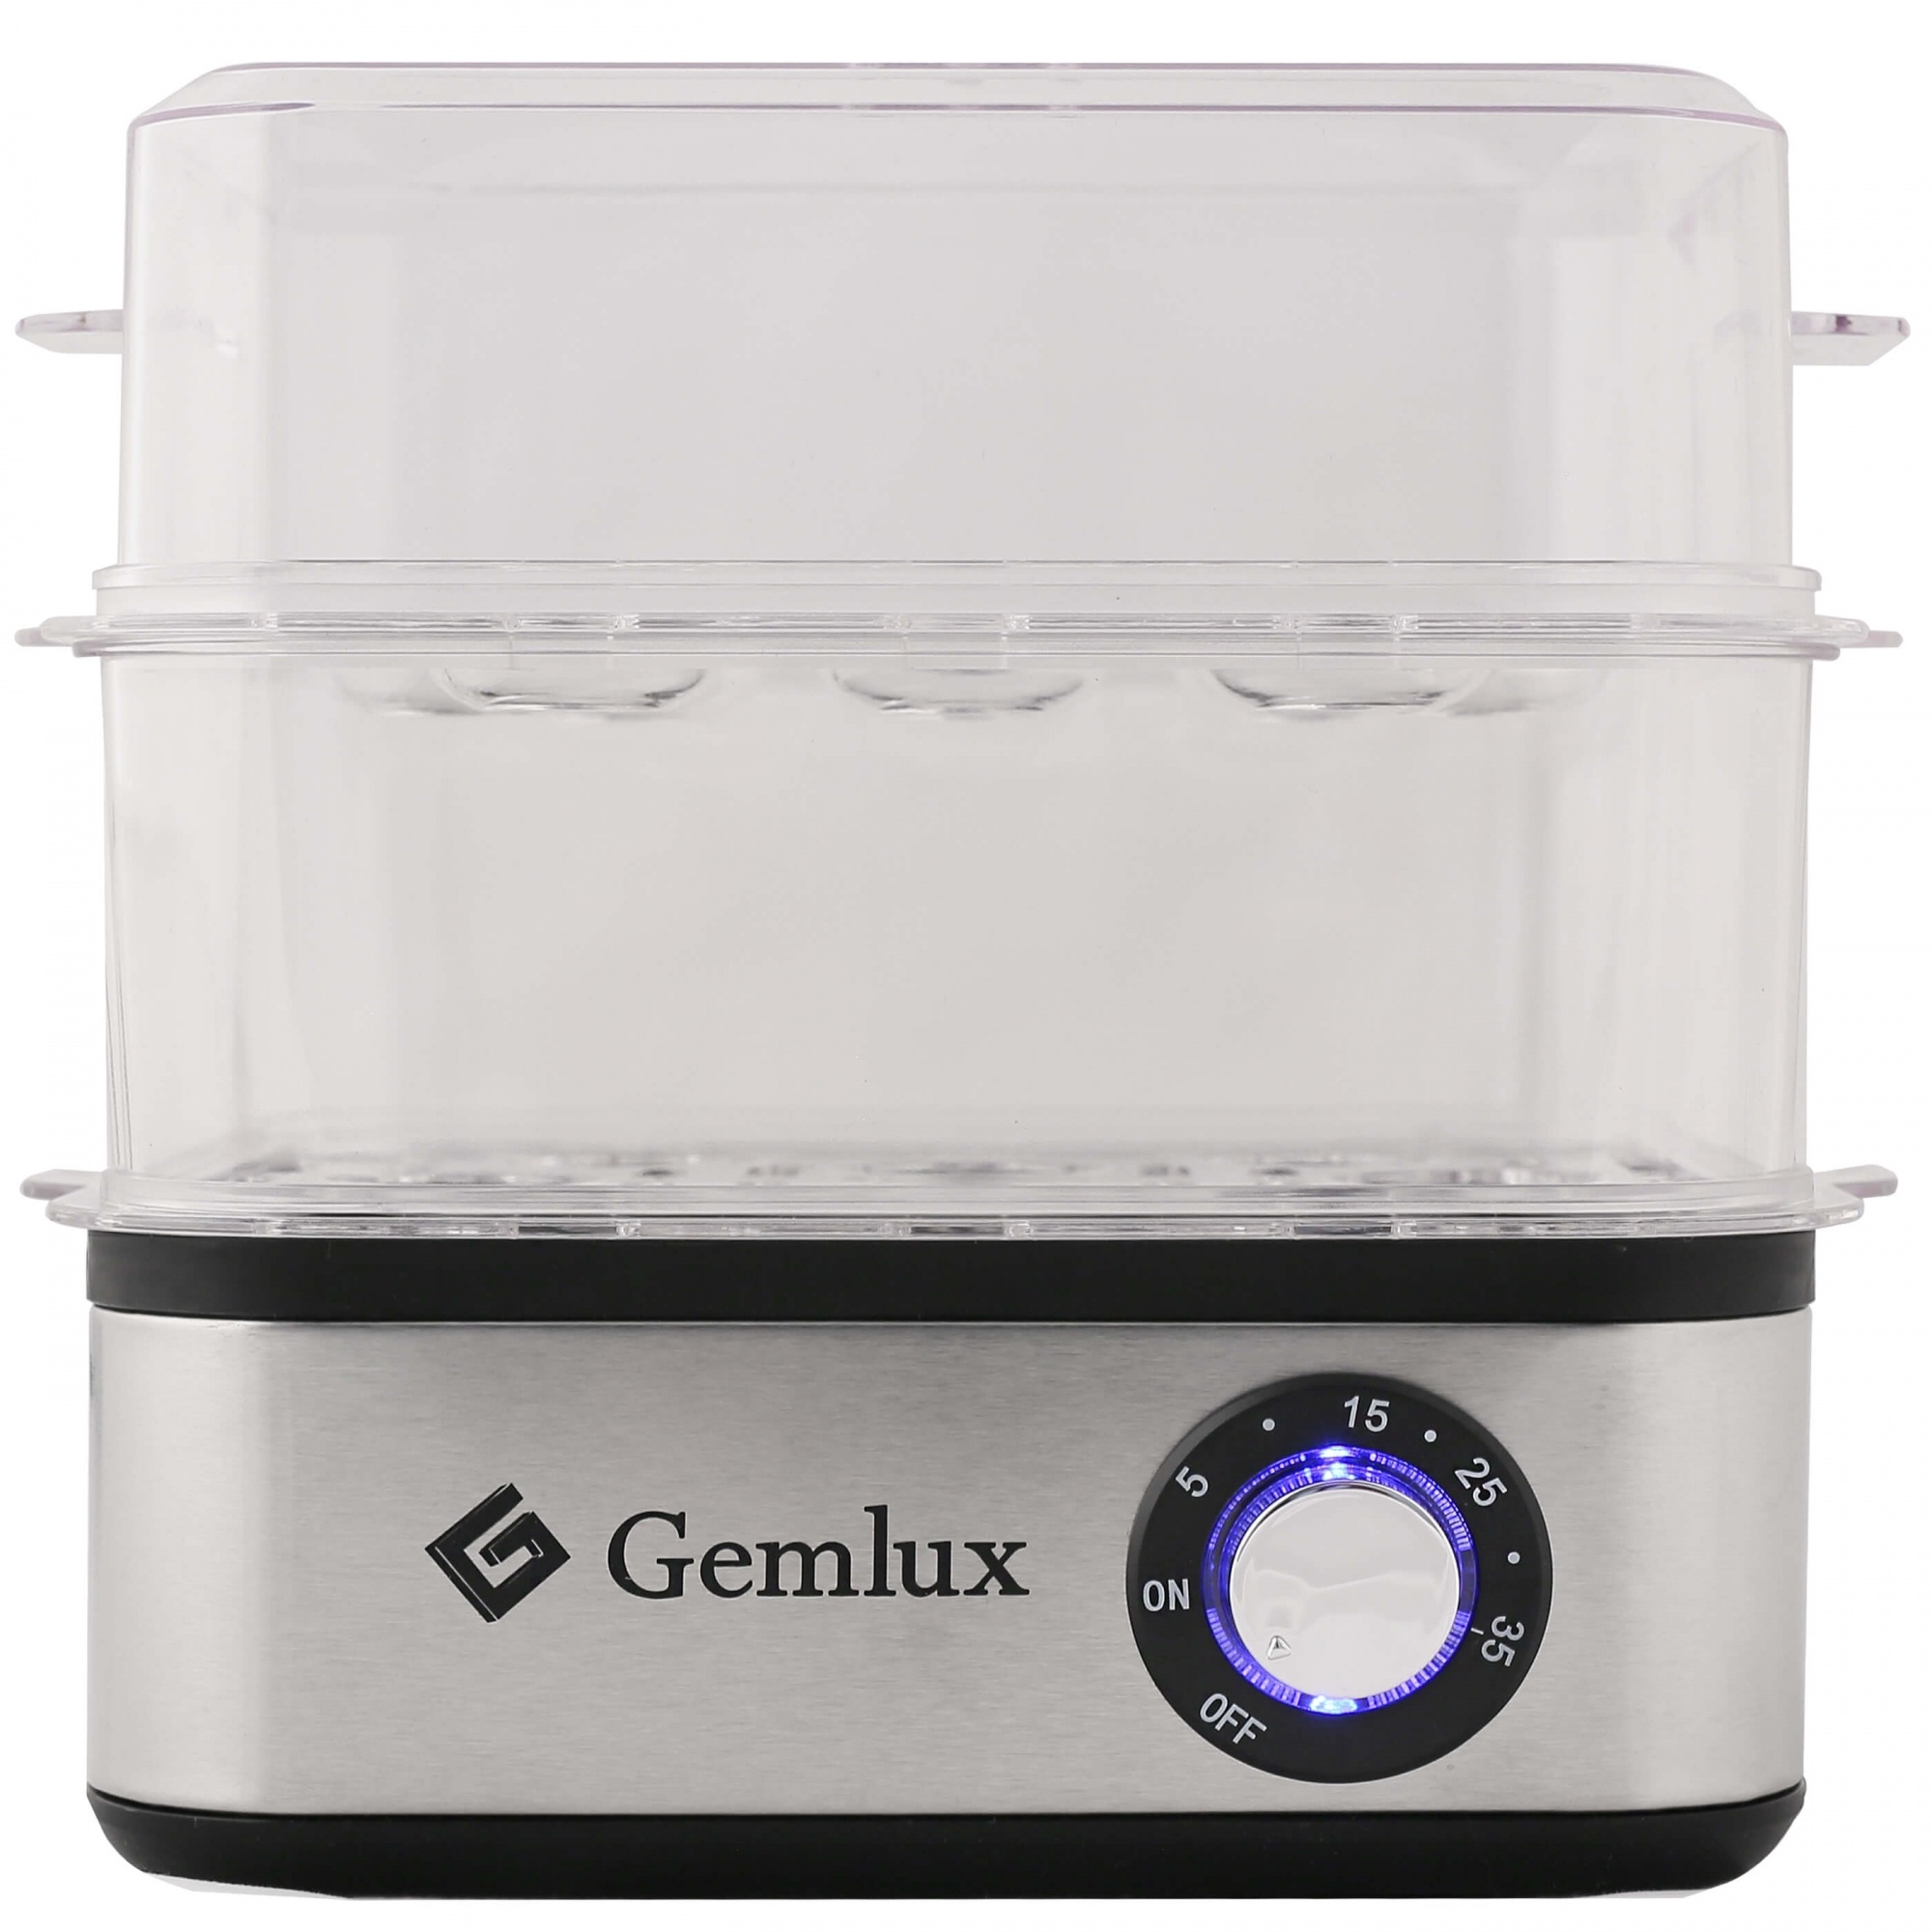 Яйцеварка GEMLUX GL EB28